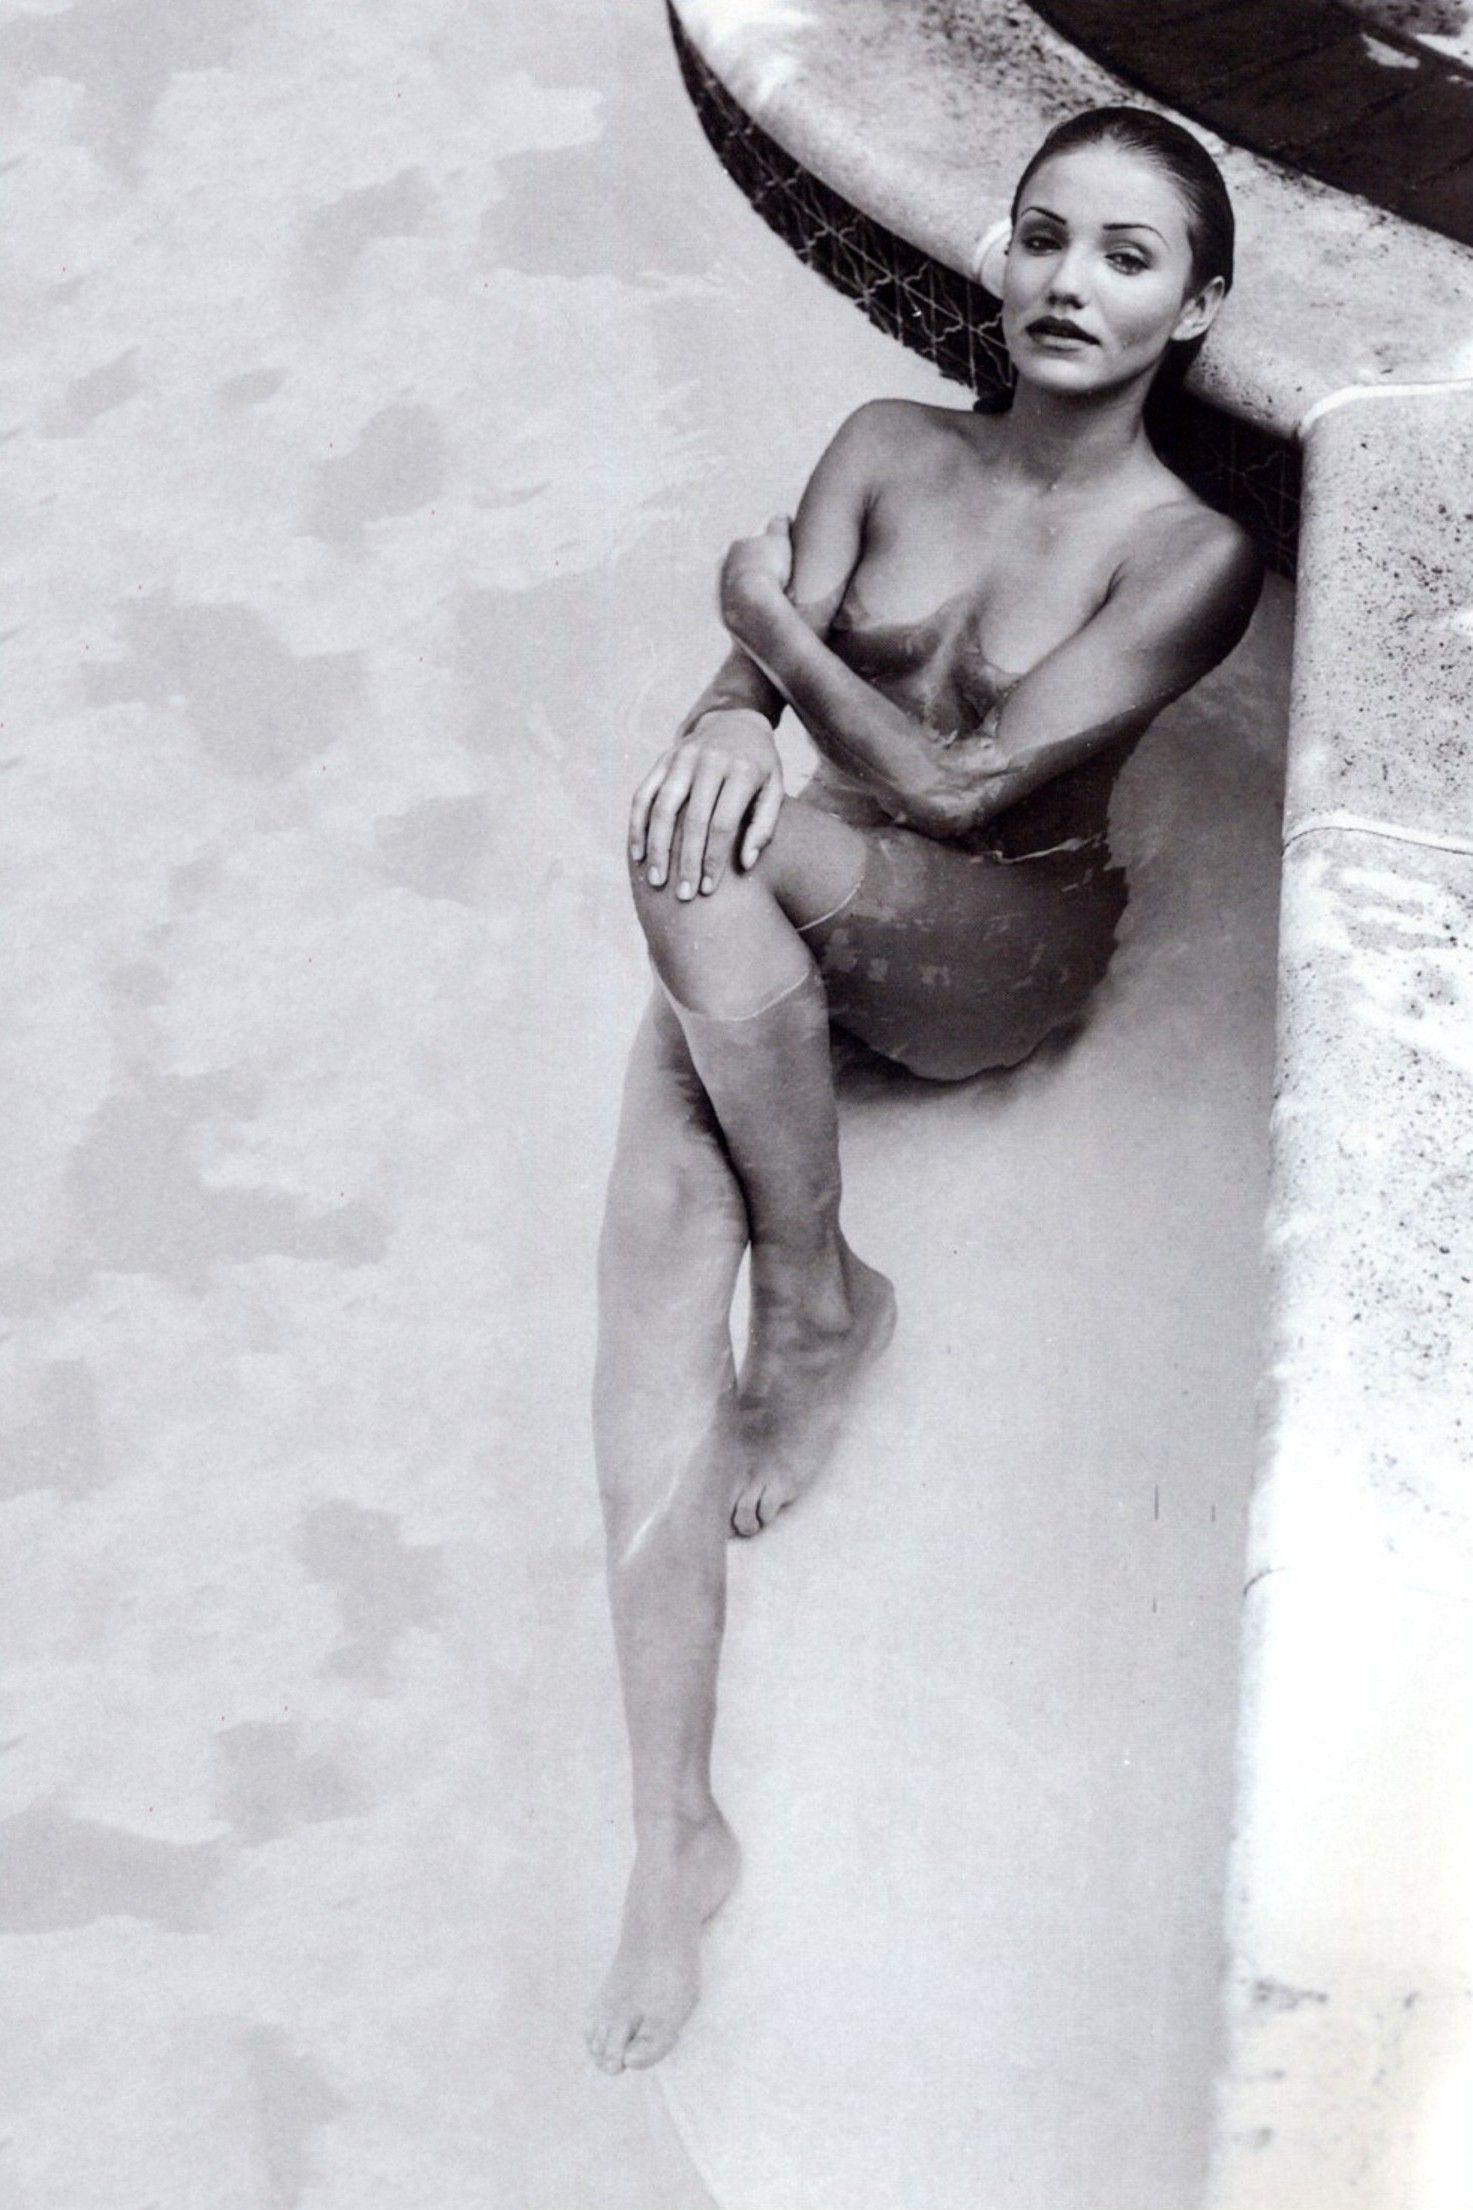 Russian nudist beaches